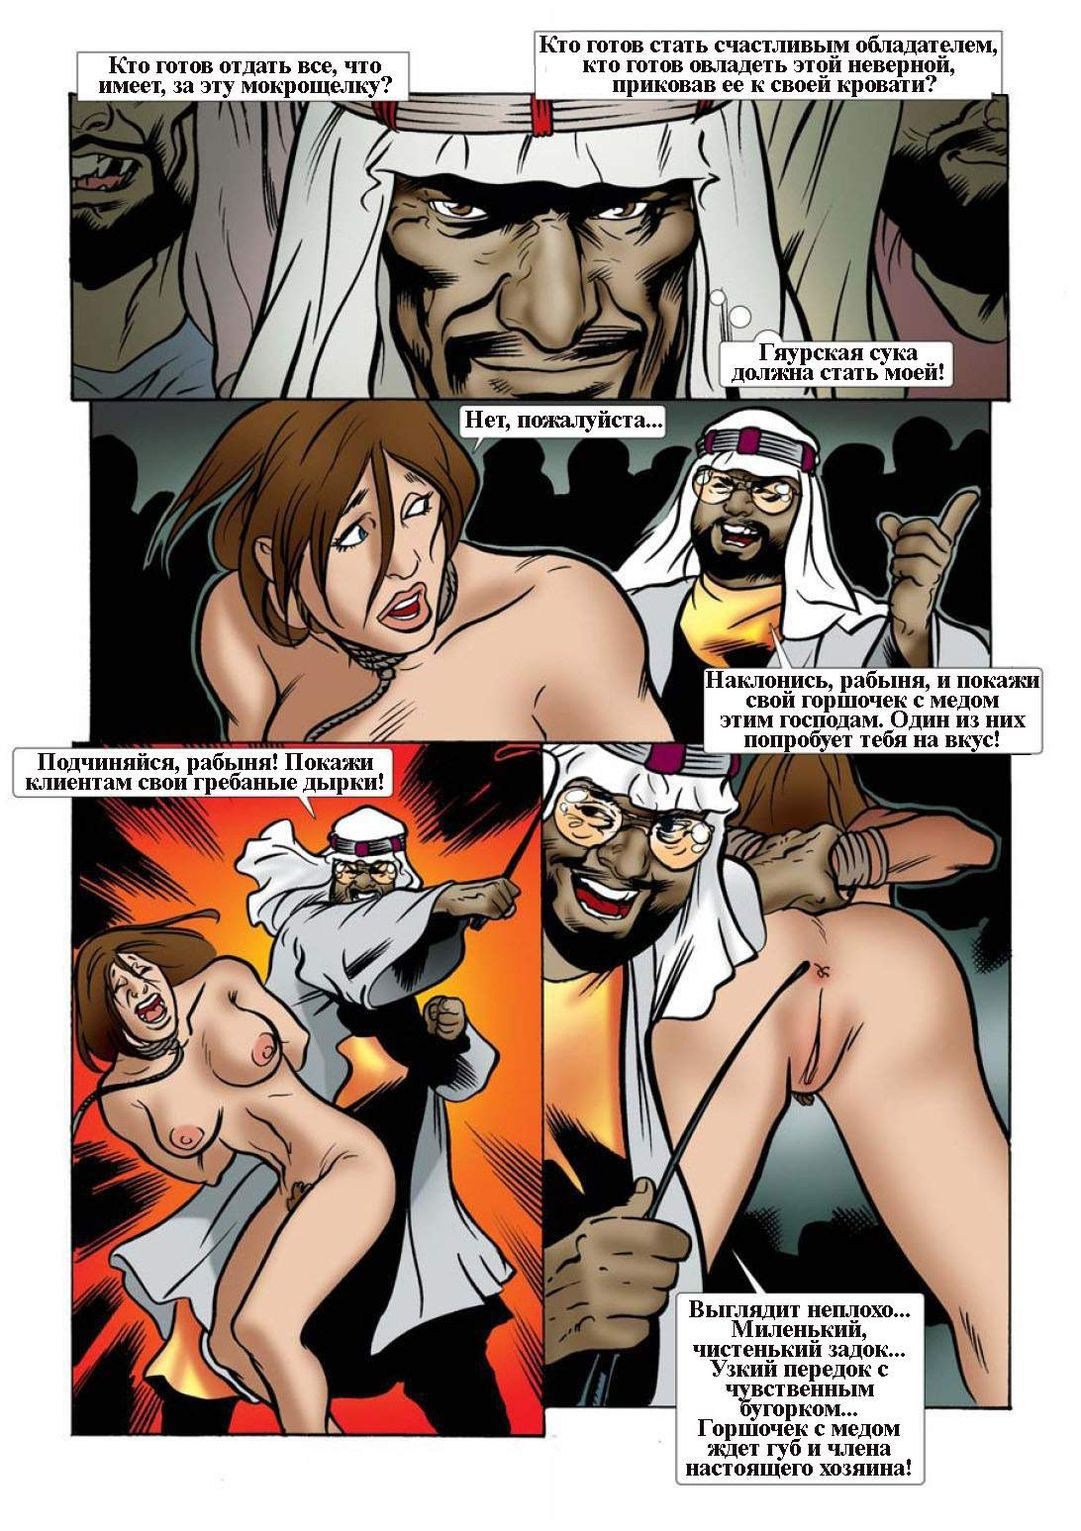 Фото порно комиксы садомазо